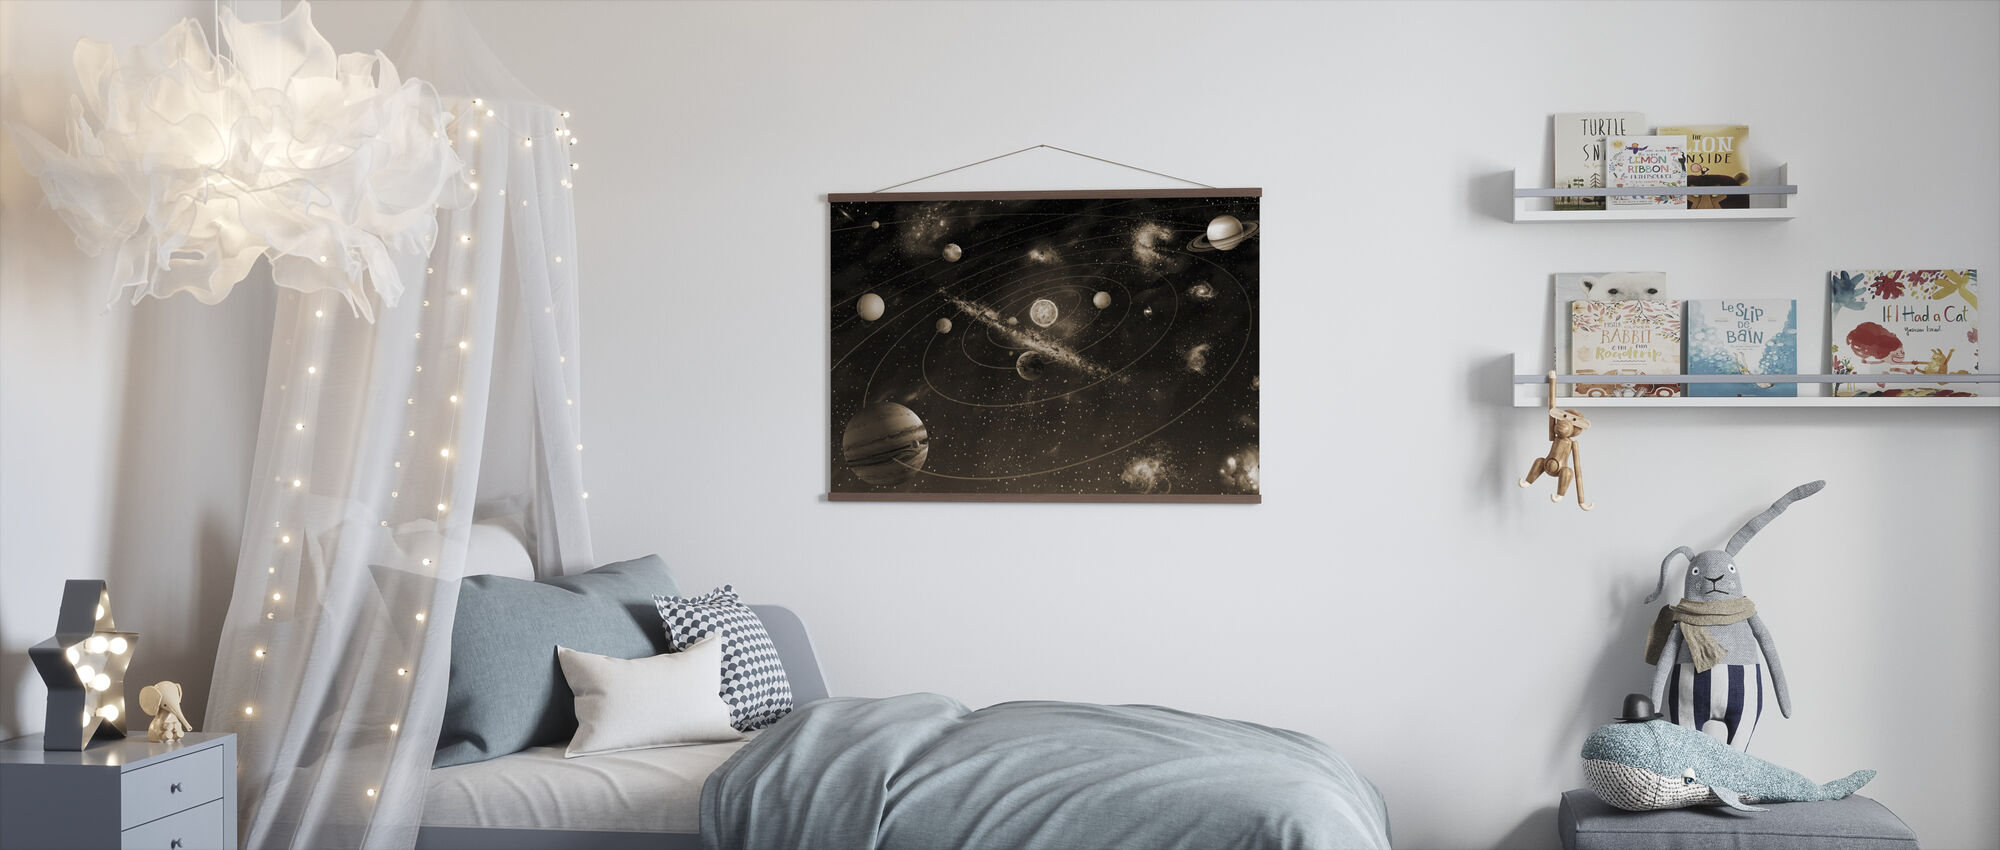 Solsystem - Sepia - Plakat - Barnerom